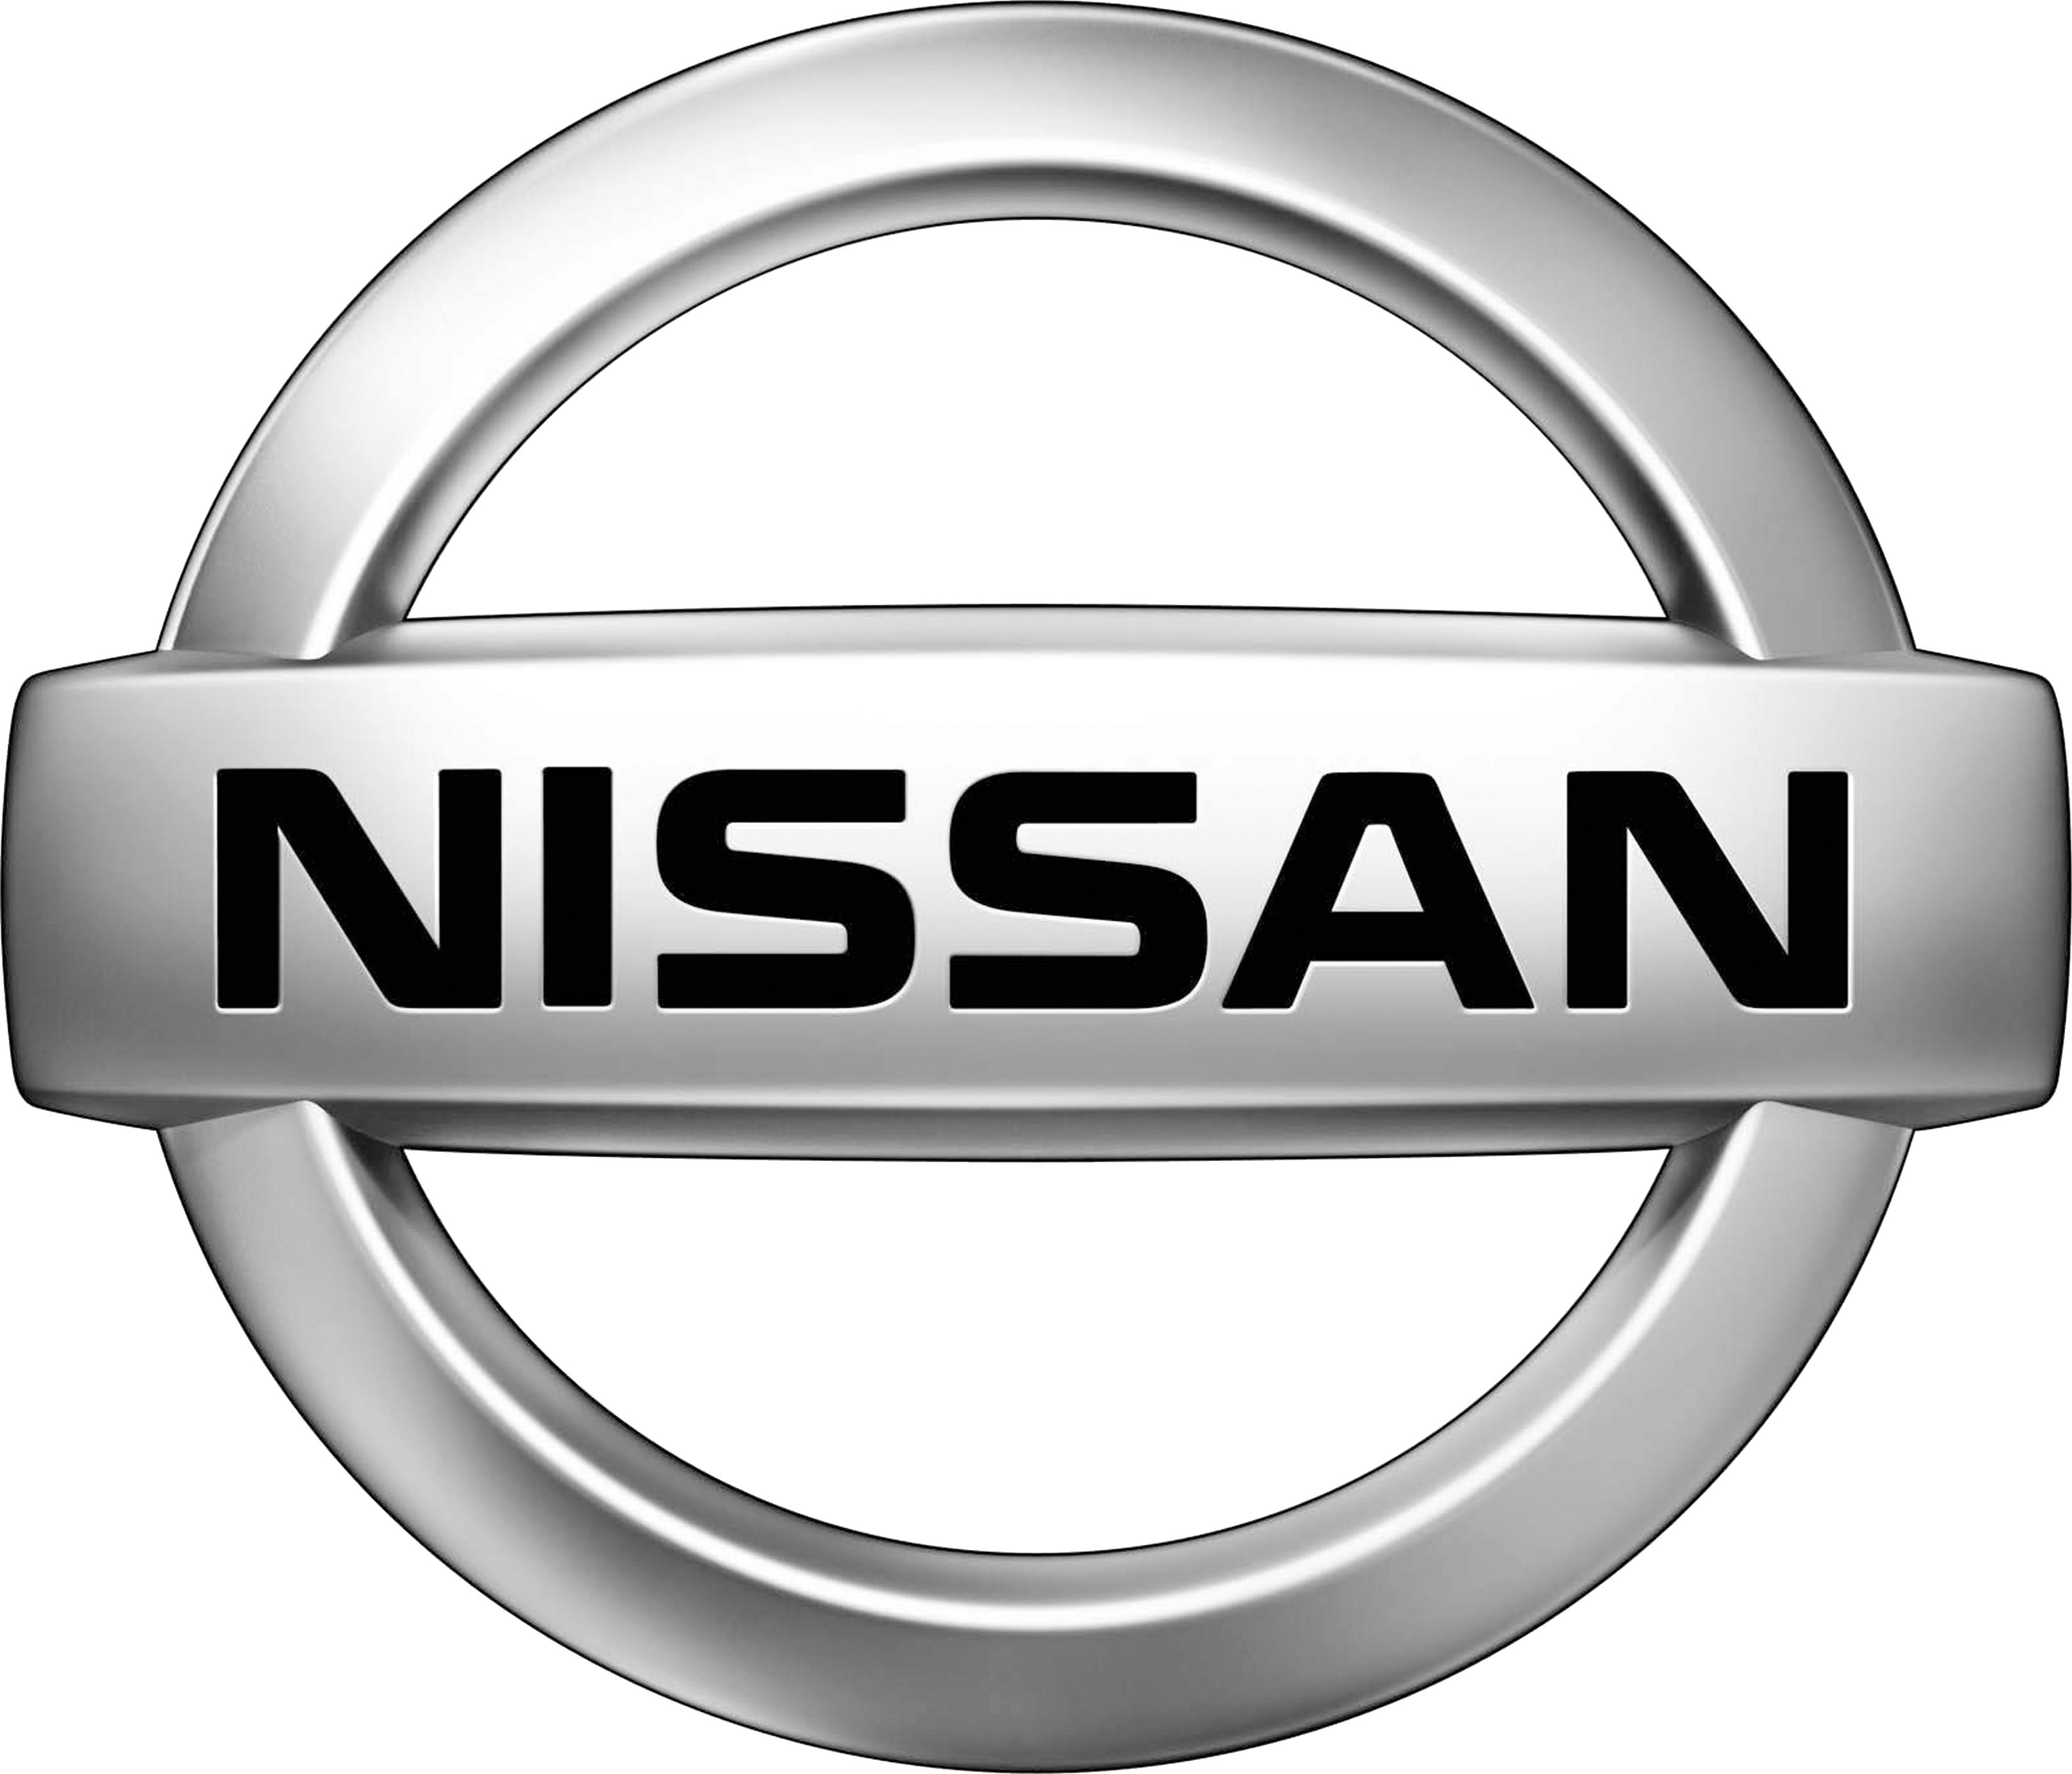 Excalibur Auto Body Works on NISSAN